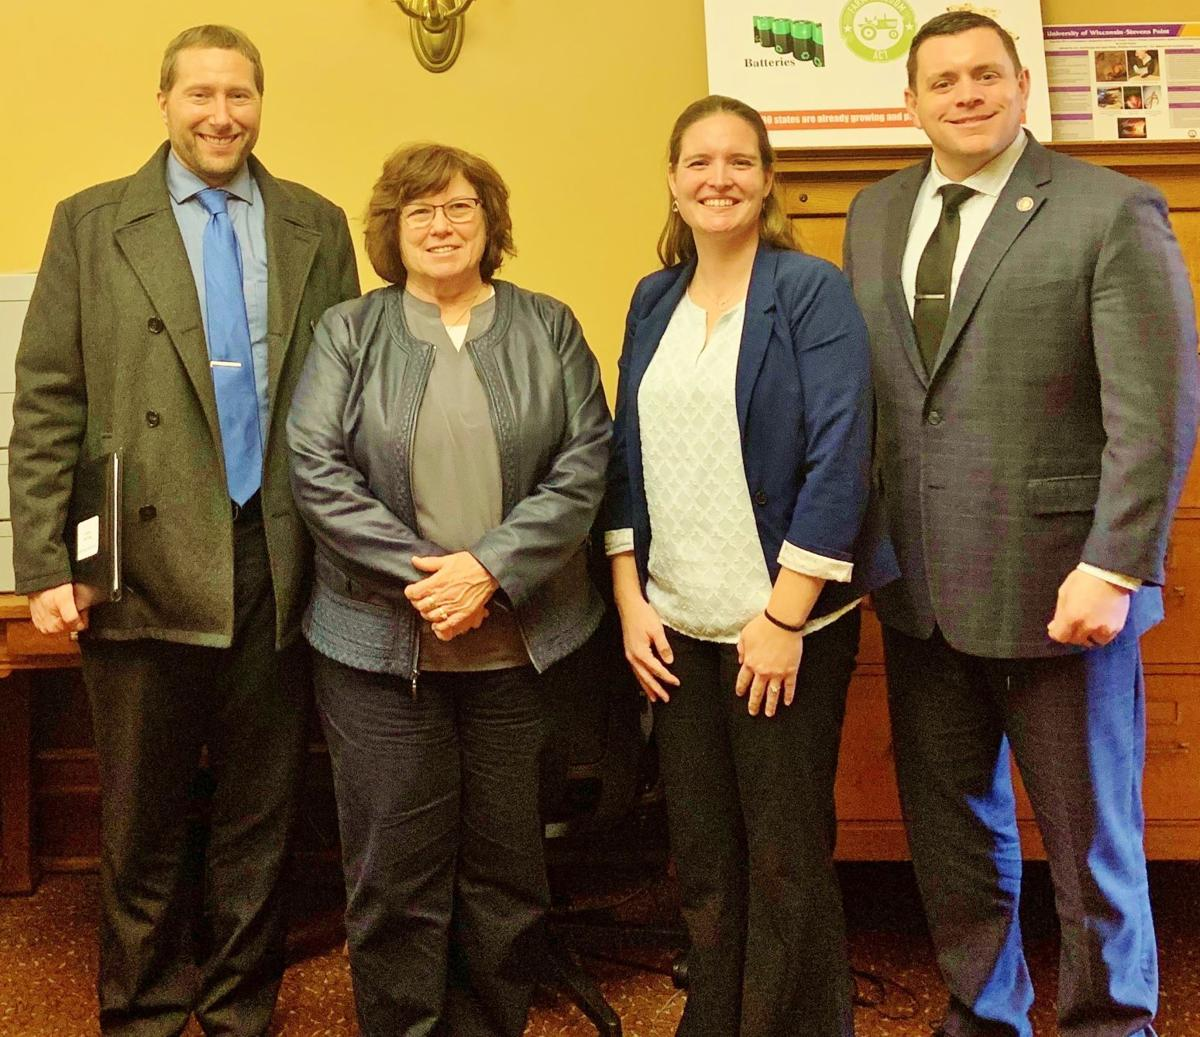 Leaders from Waushara County Farm Bureau and Wisconsin Sen. Patrick Testin